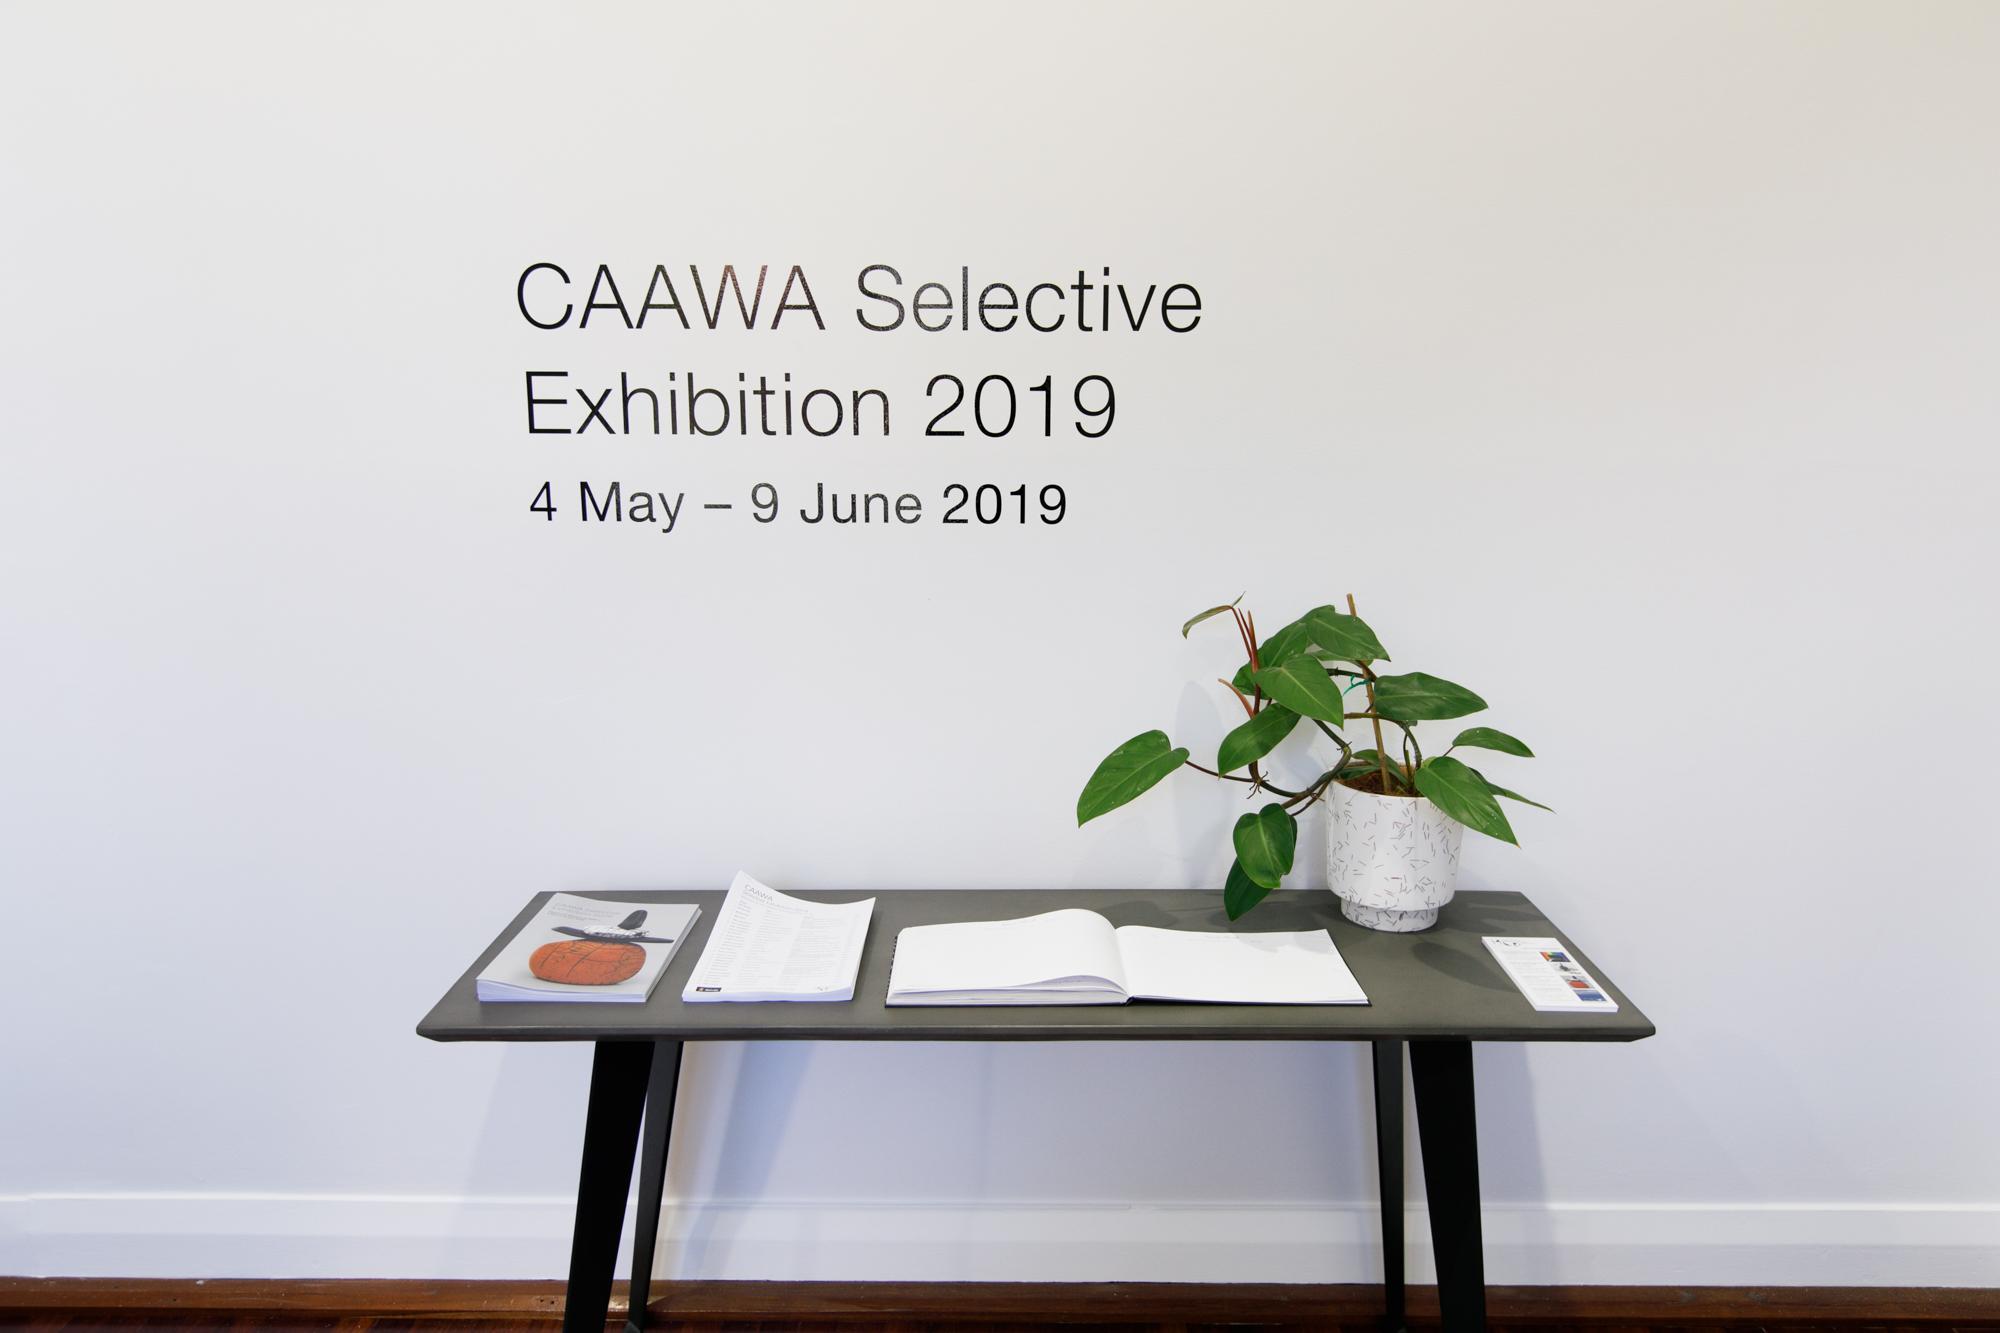 CAAWA19_Websize-01.jpg